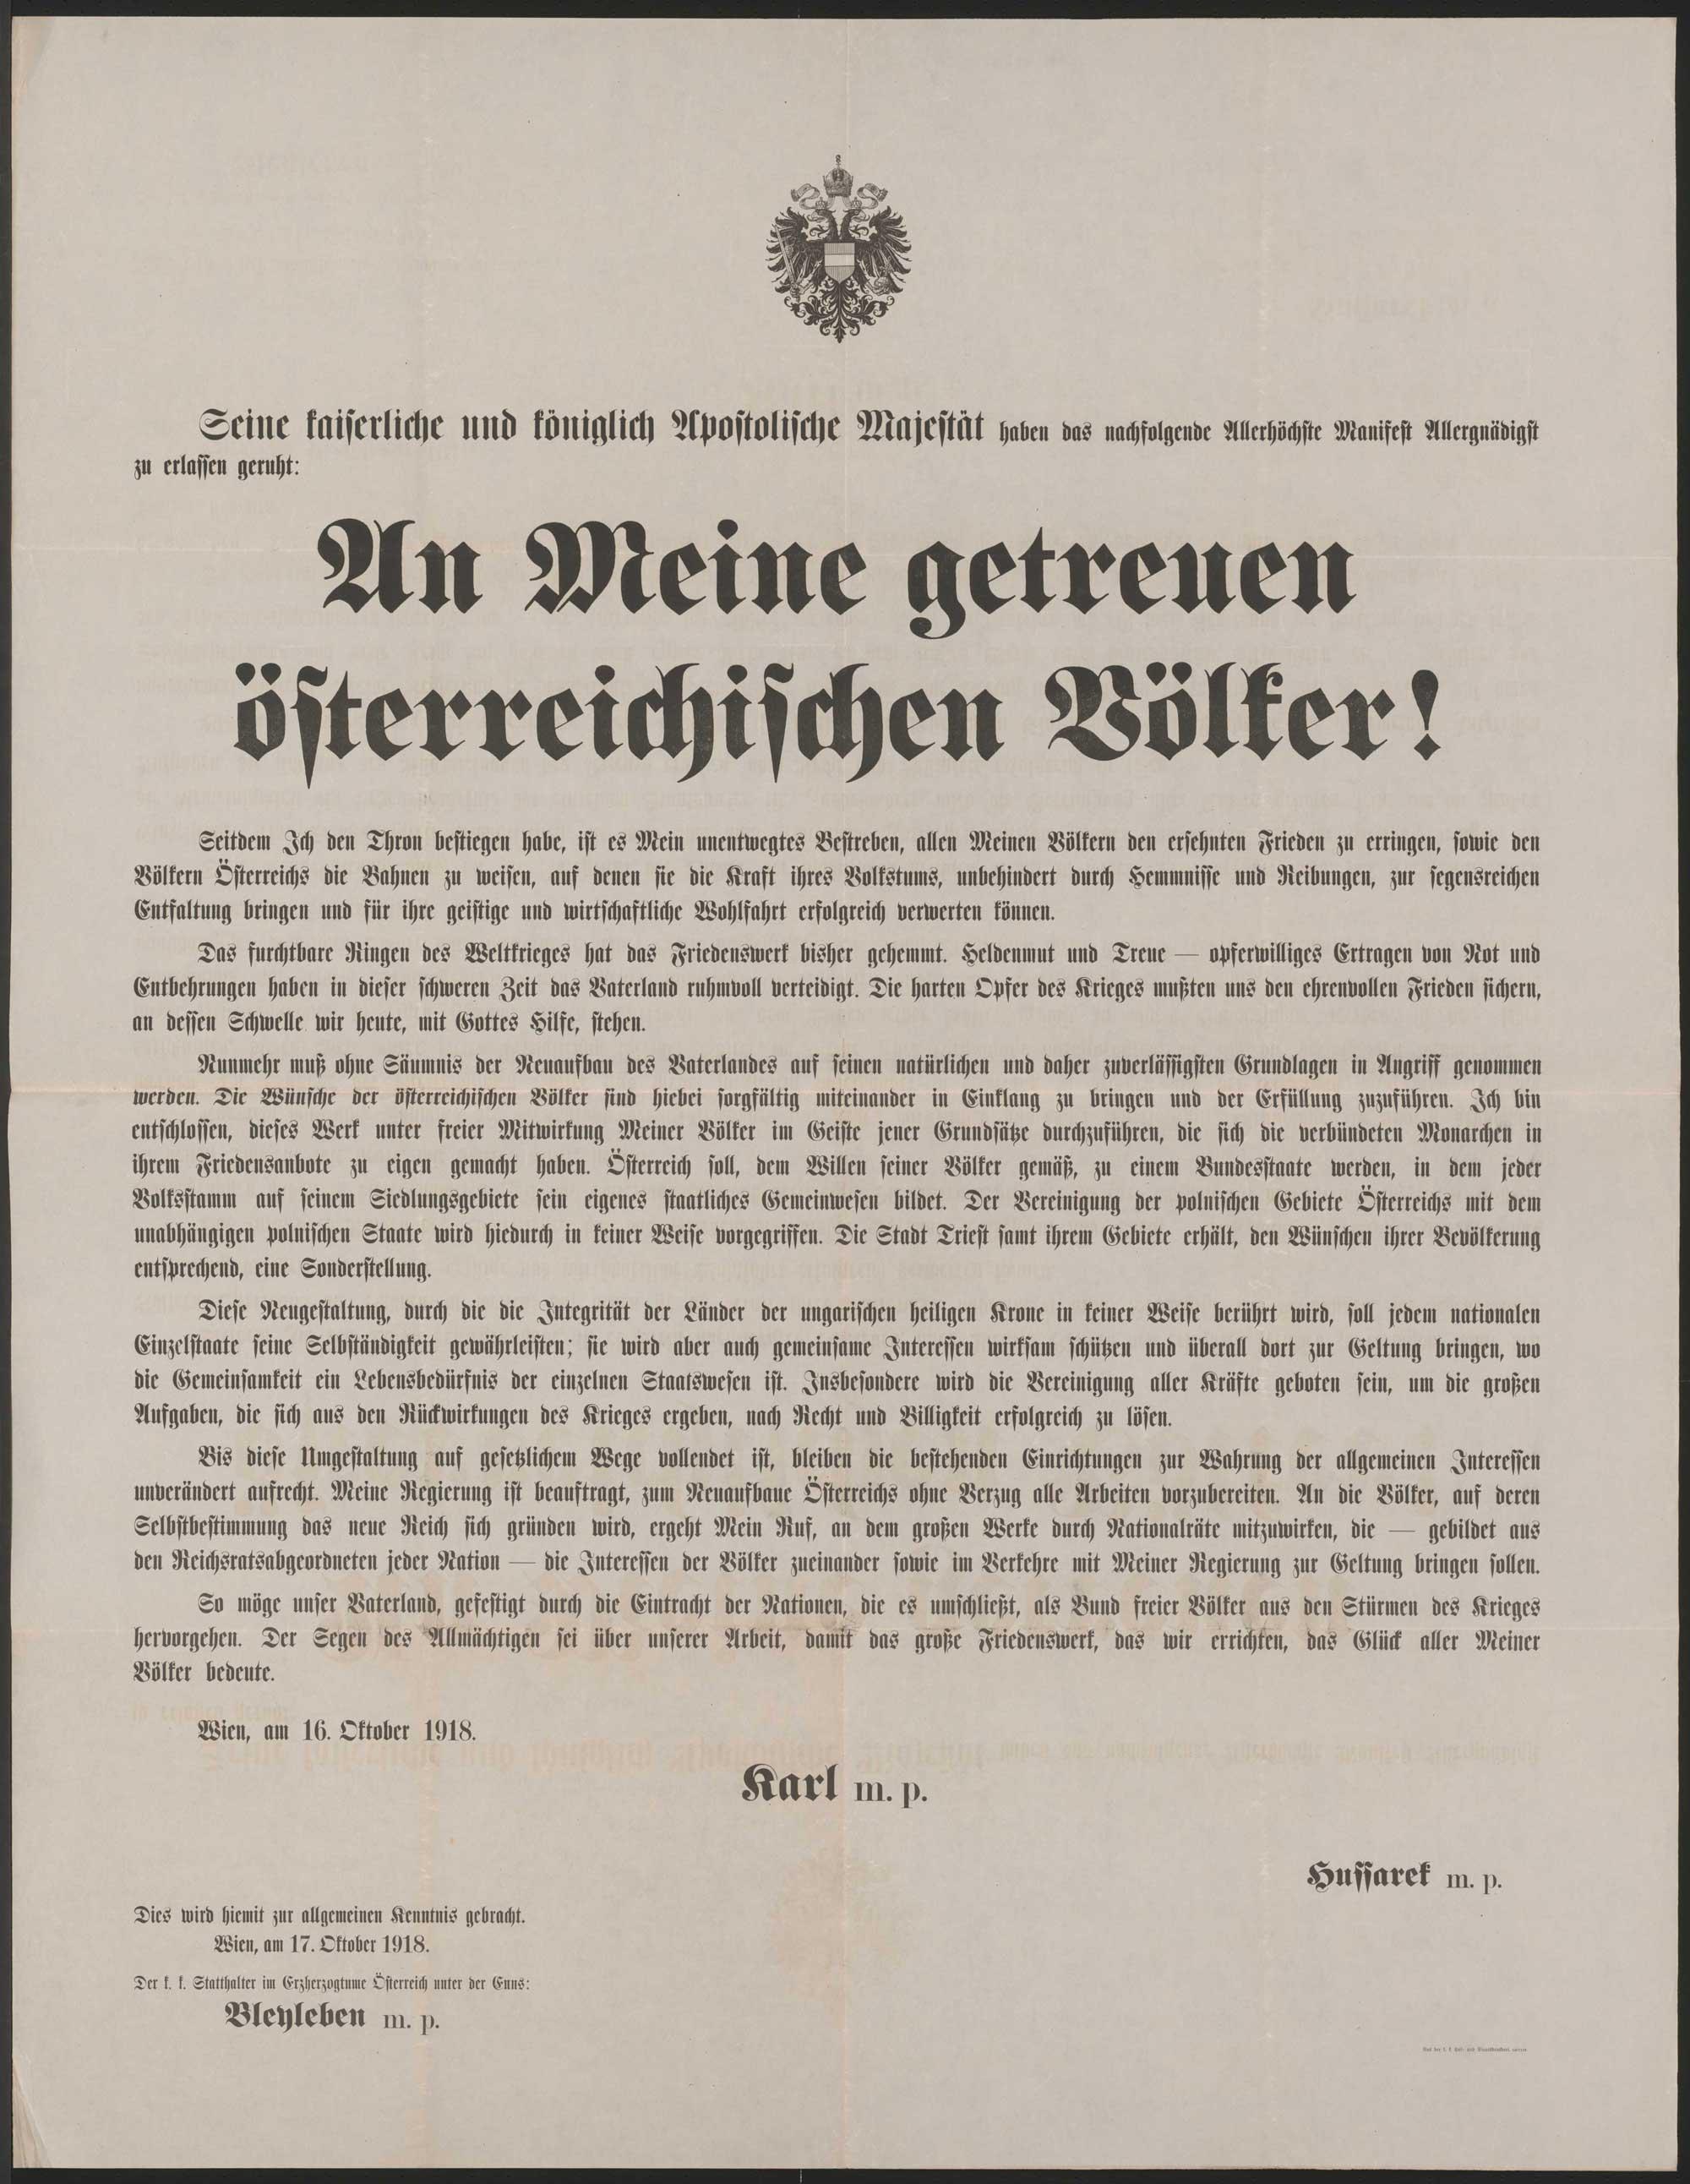 Charles I von Habsurg manifesto from 16 October 1918. Source: Austrian National Archive